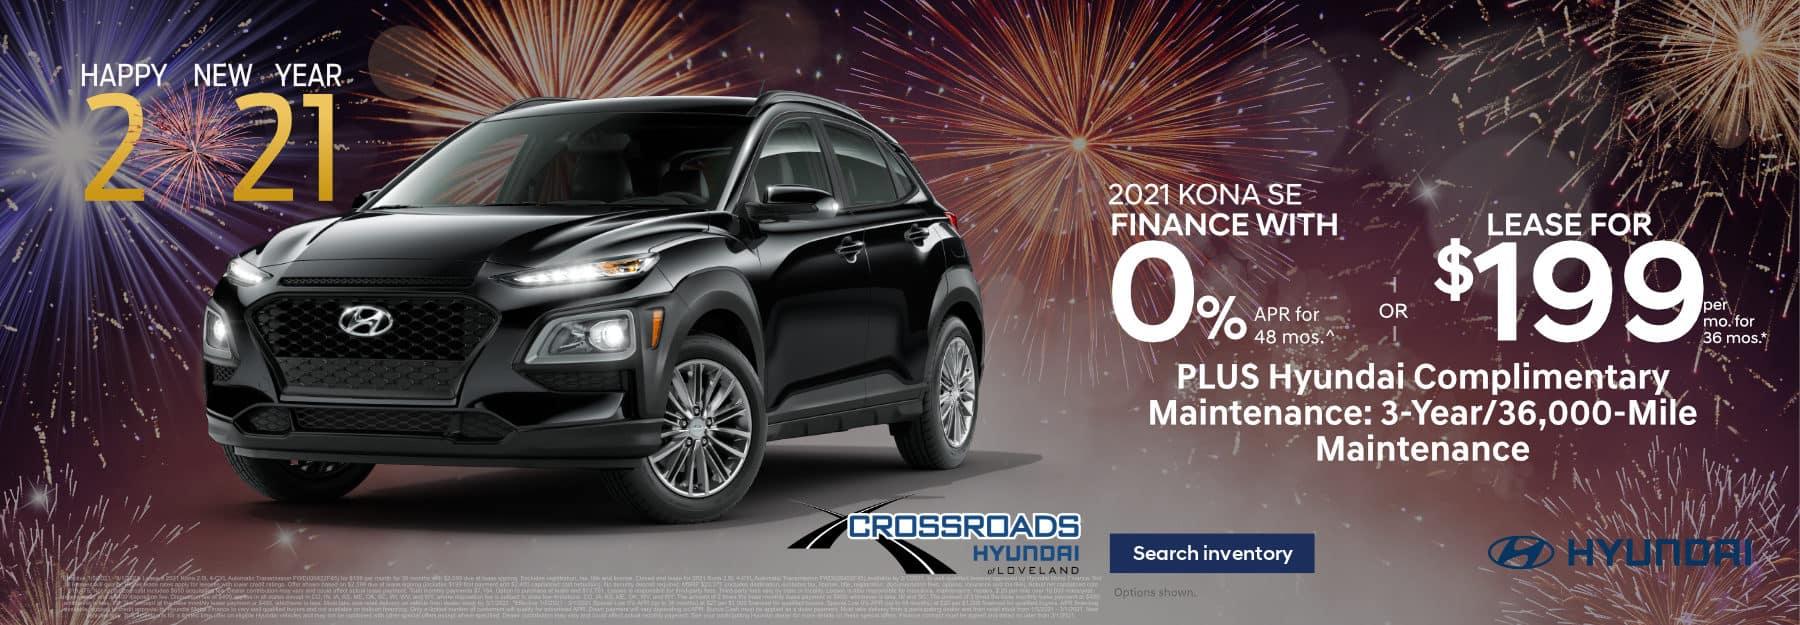 January_2021_KONA_CROSSROADS_Hyundai